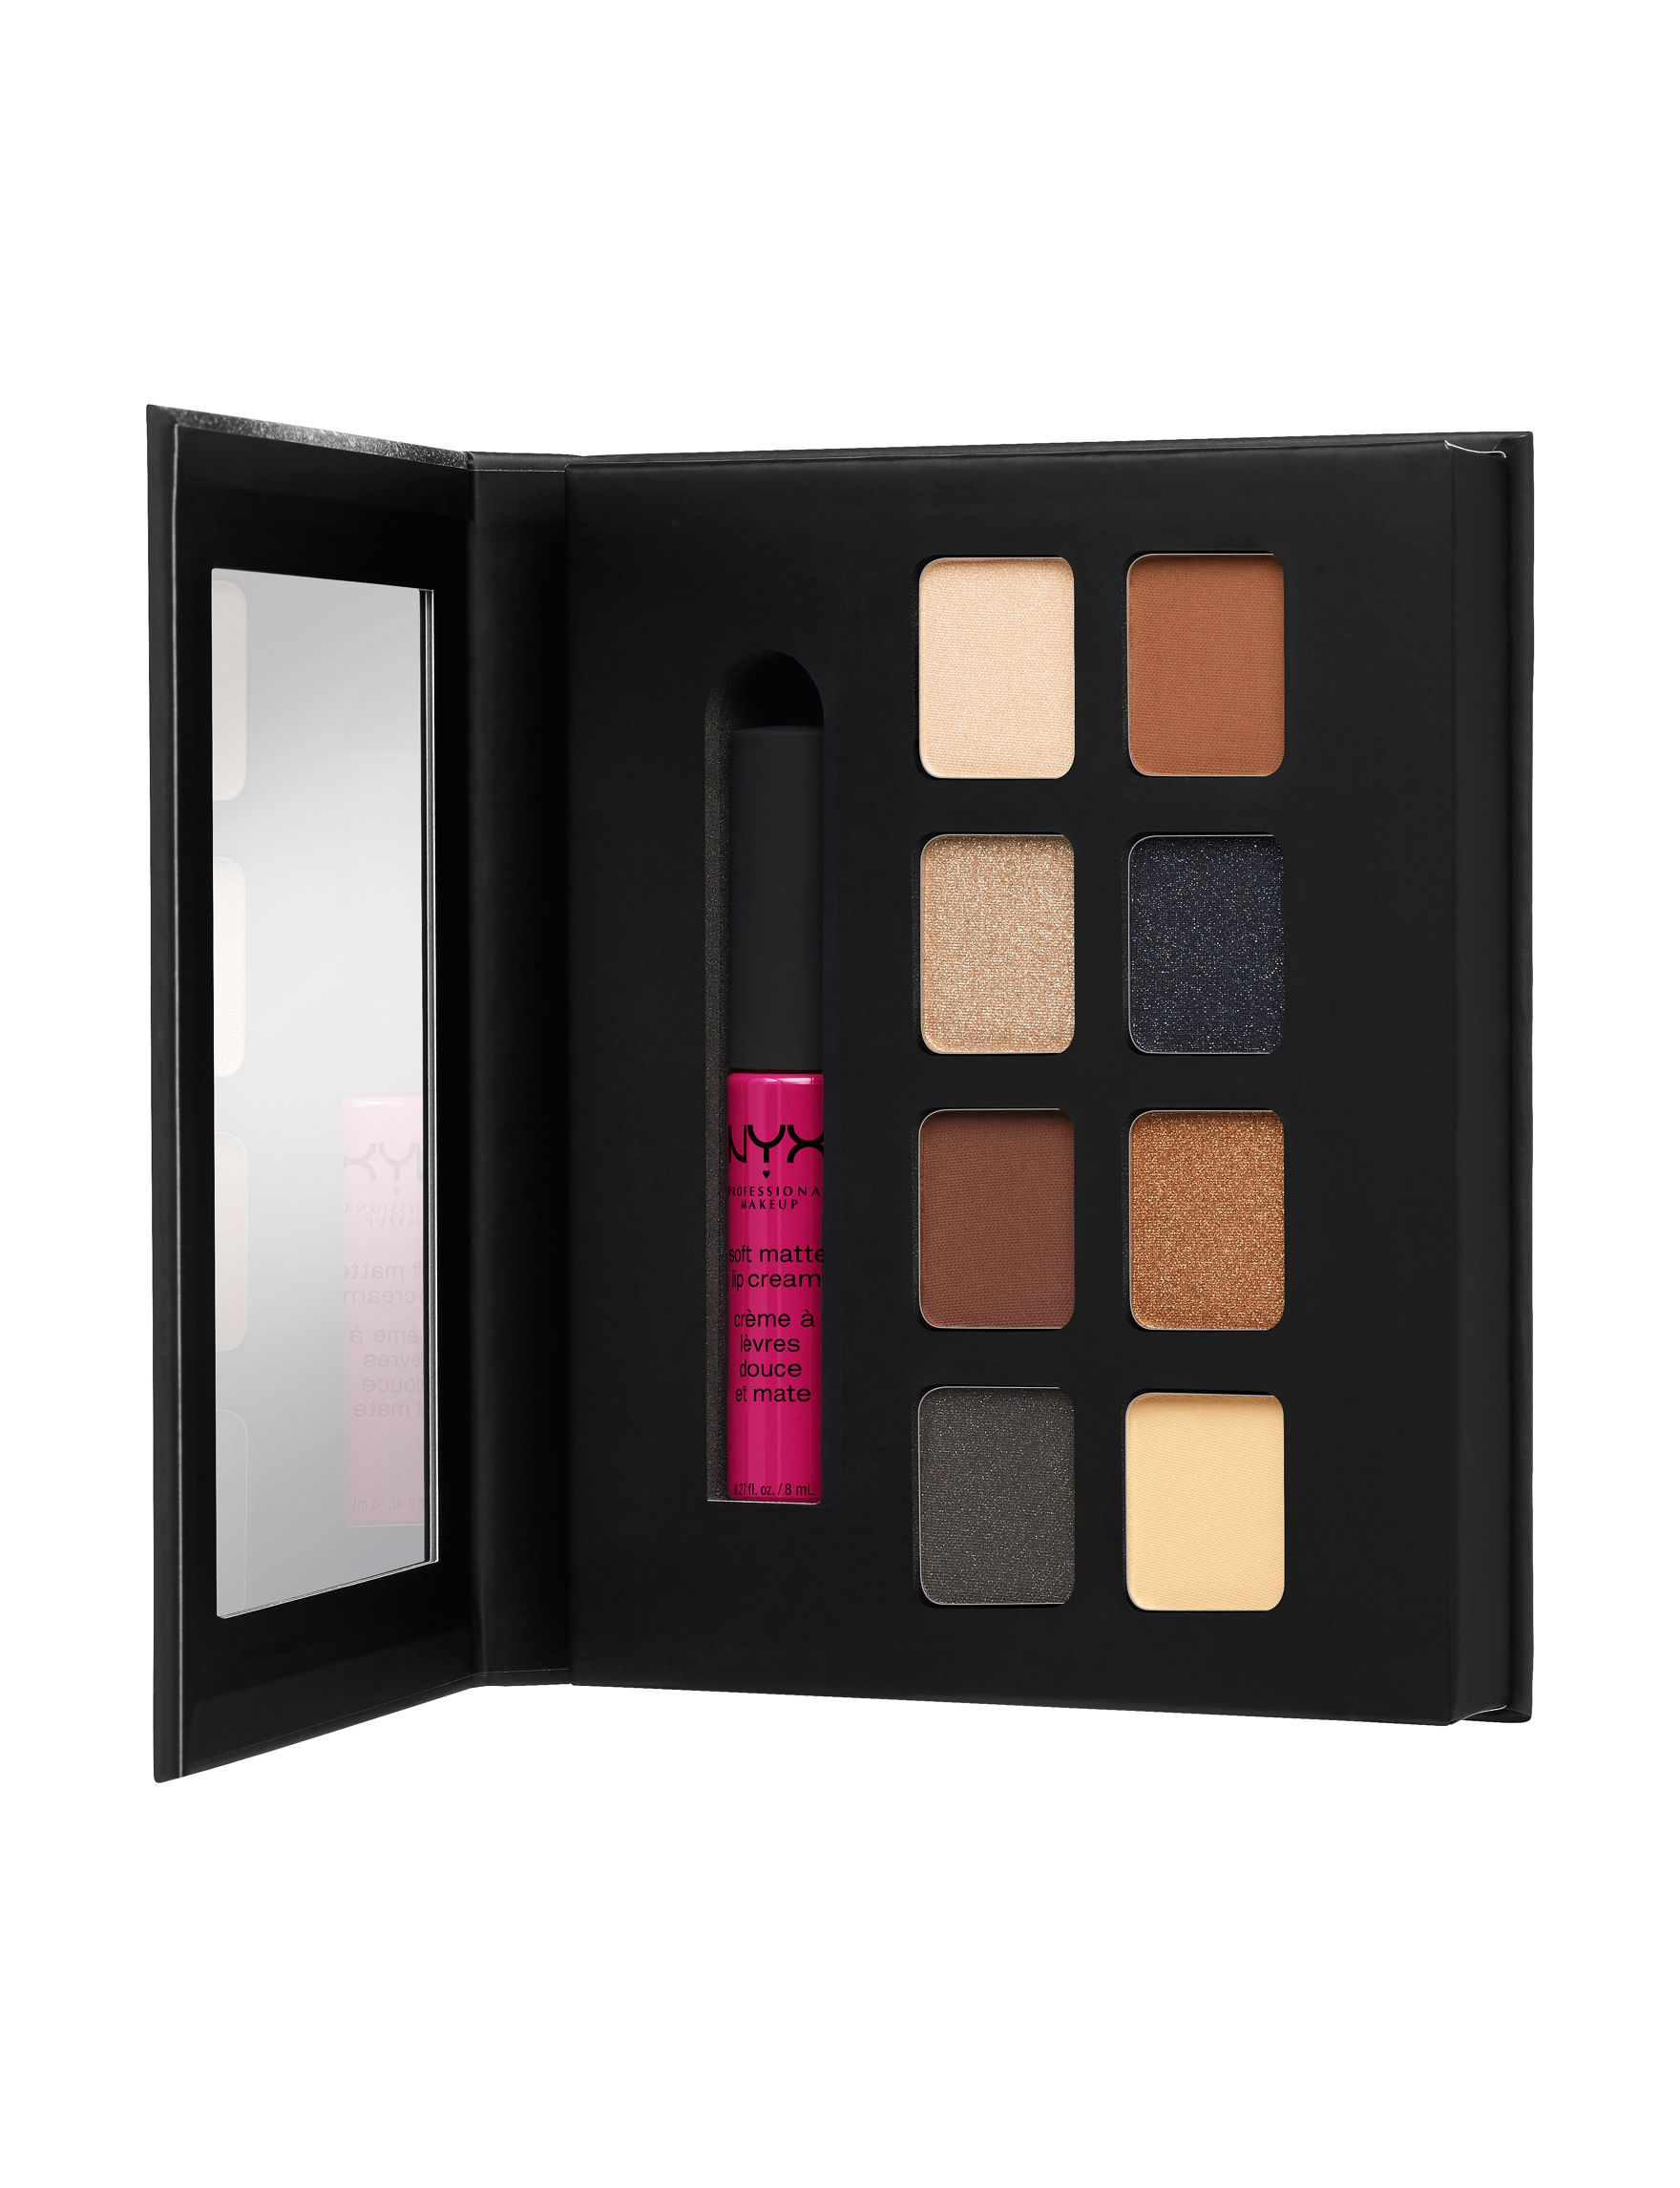 NYX Professional Makeup Paris Eyes Lips Makeup Kits & Sets